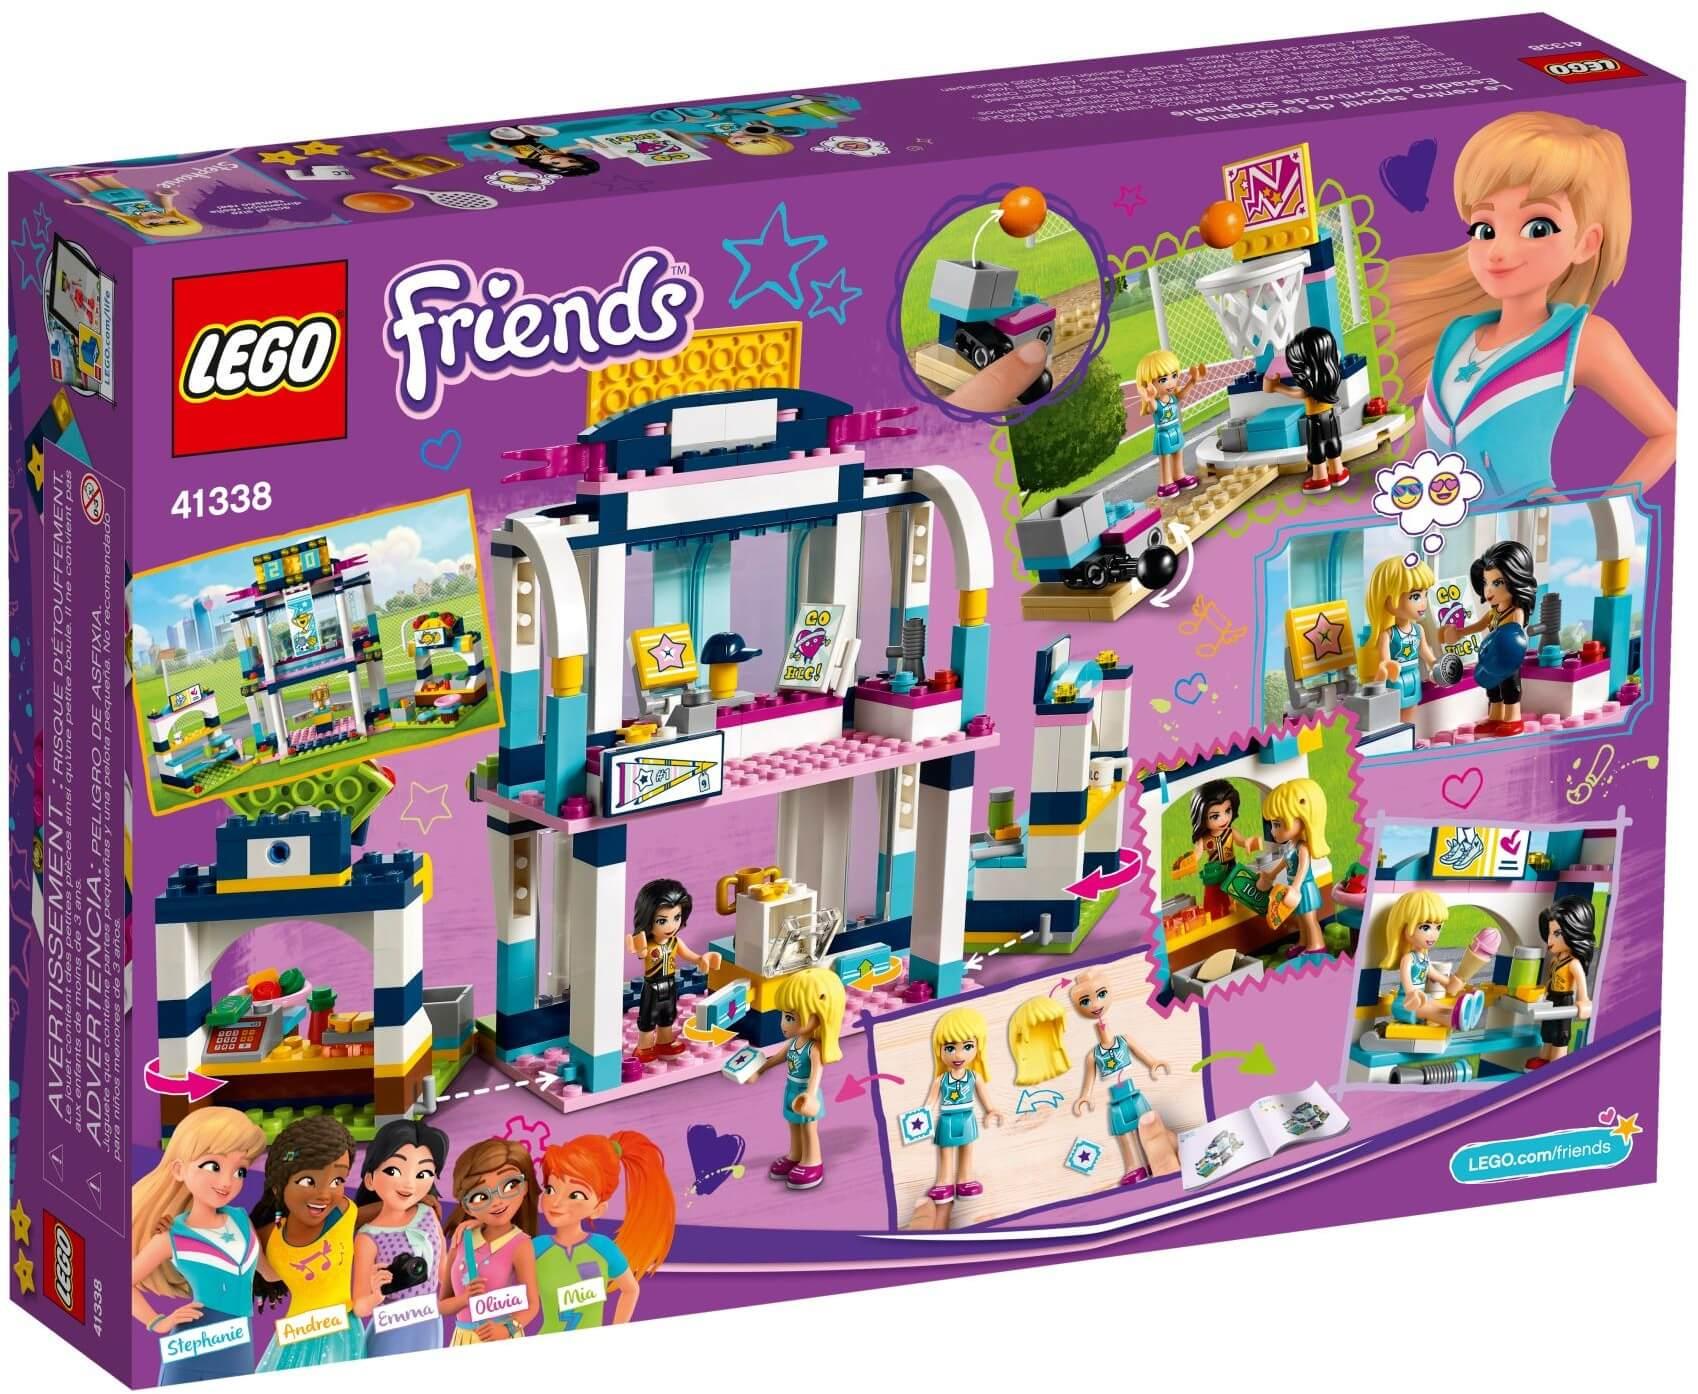 Mua đồ chơi LEGO 41338 - LEGO Friends 41338 - Trung tâm thể dục thể thao của Stephanie (LEGO Friends 41338 Stephanie's Sports Arena)